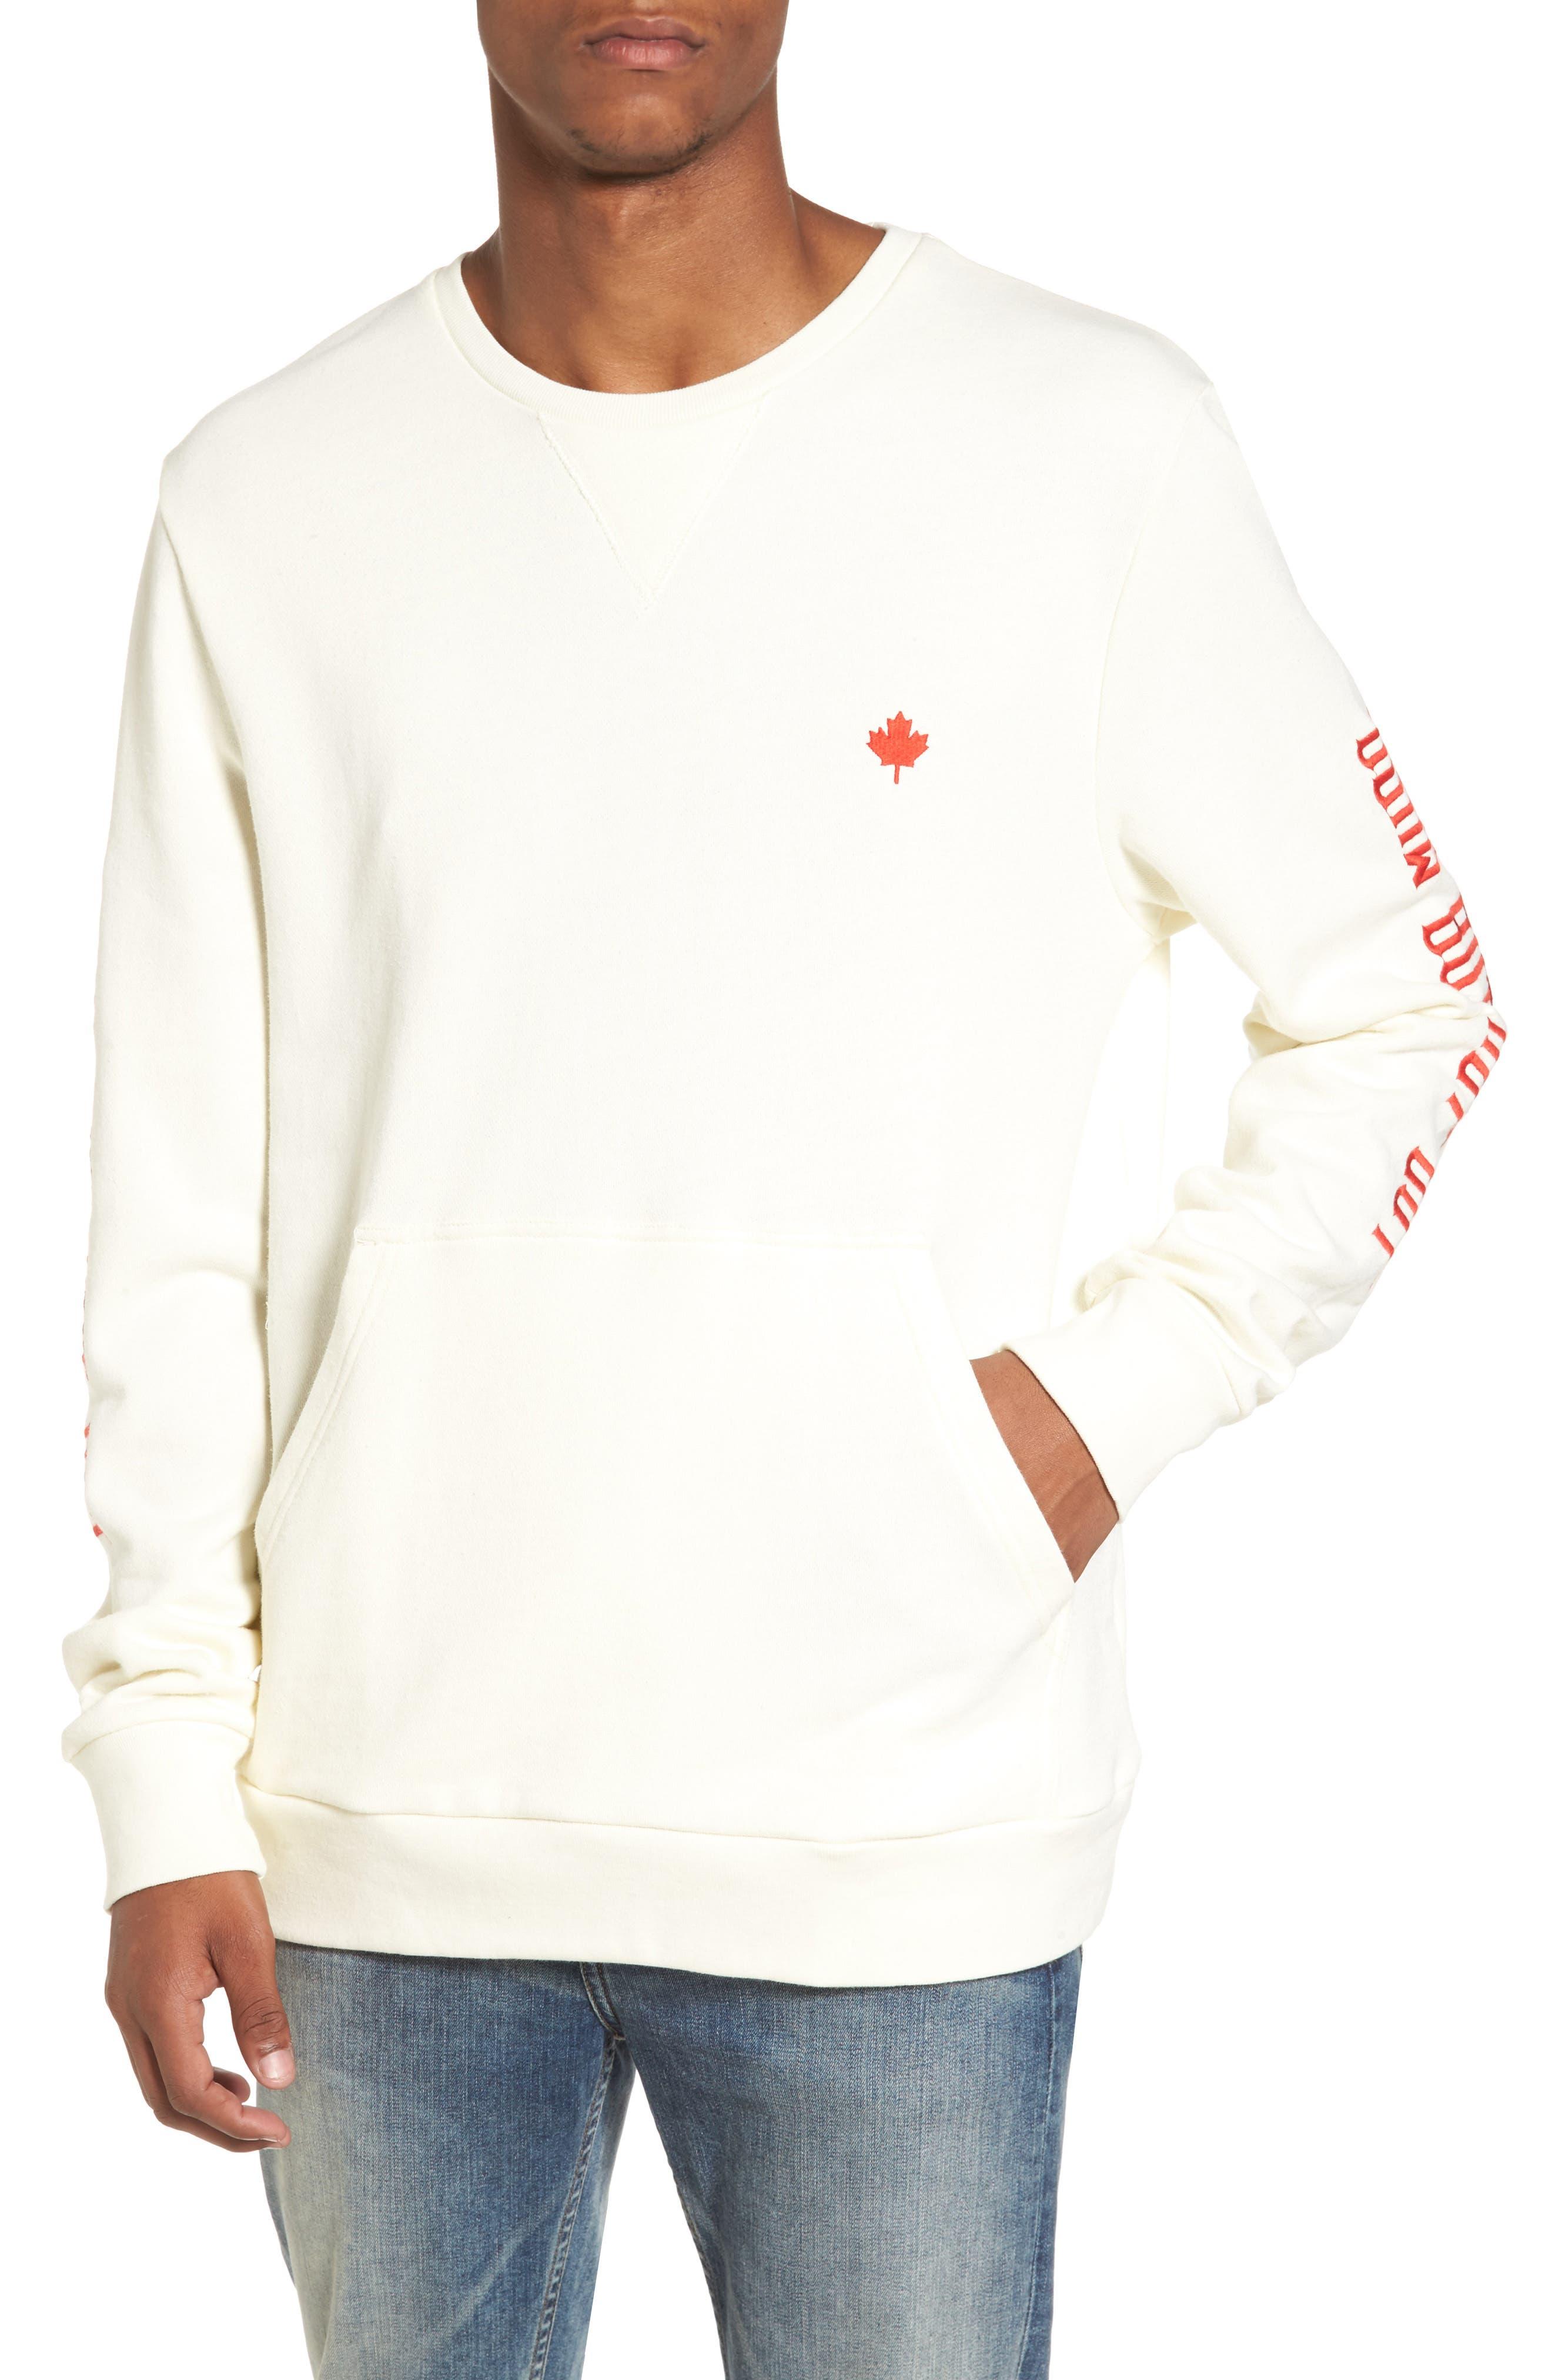 Up North Fleece Sweatshirt,                             Main thumbnail 1, color,                             Bone